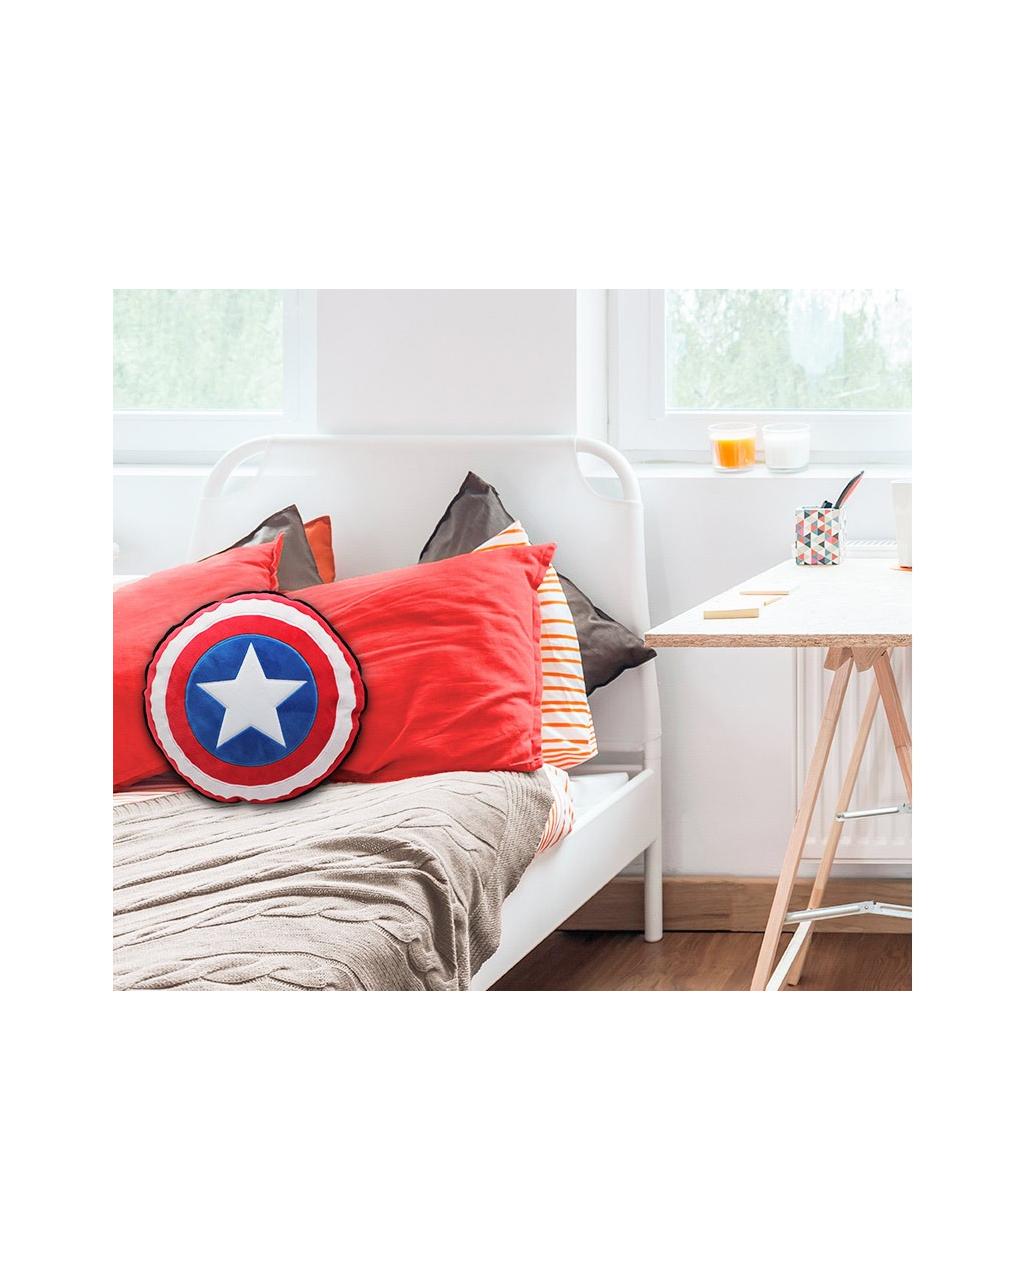 Well known Captain America Shield Pillow | Avengers | horror-shop.com UB02